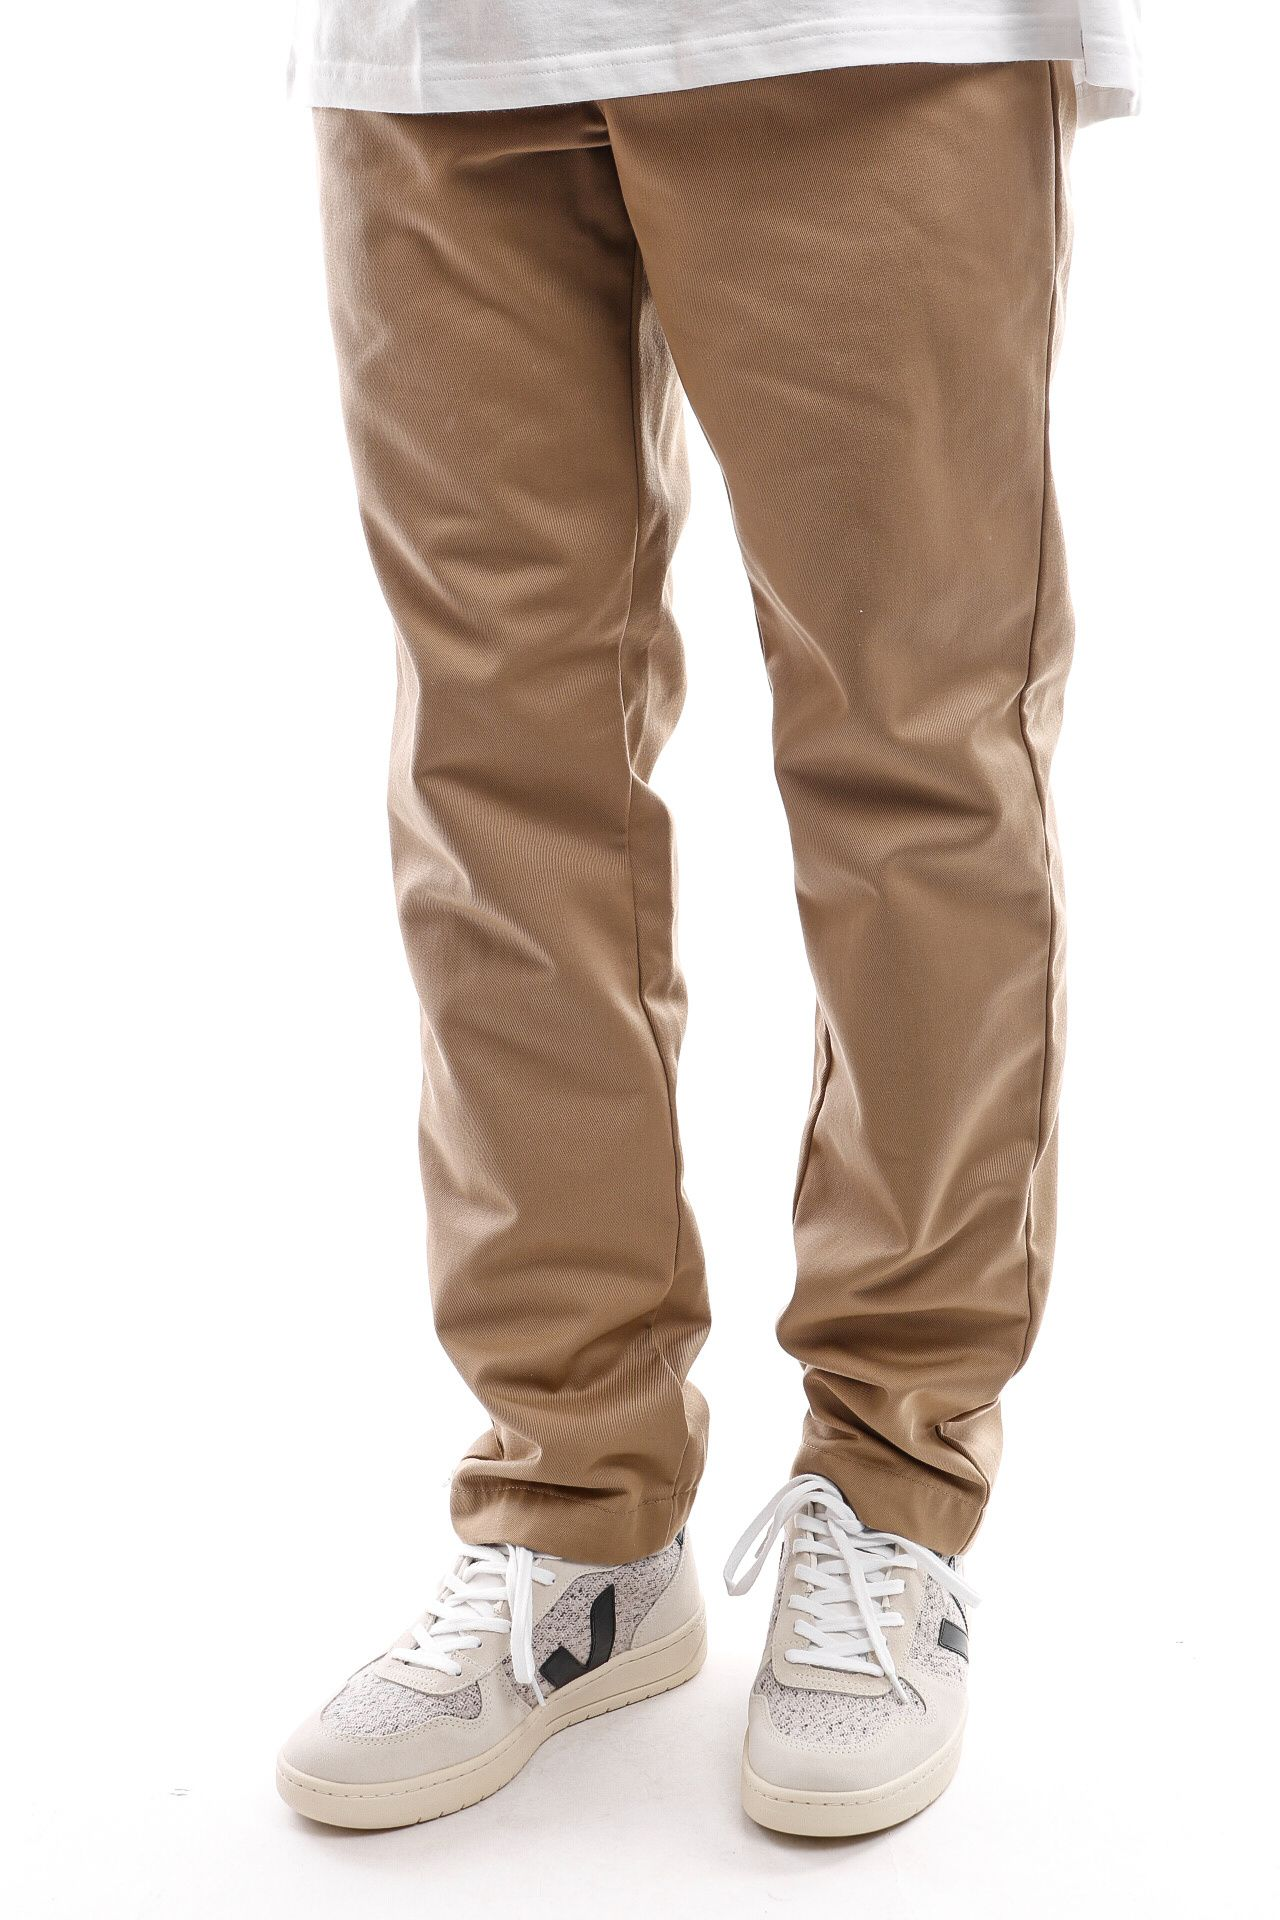 Afbeelding van Carhartt Chino Master Pant Leather I020074